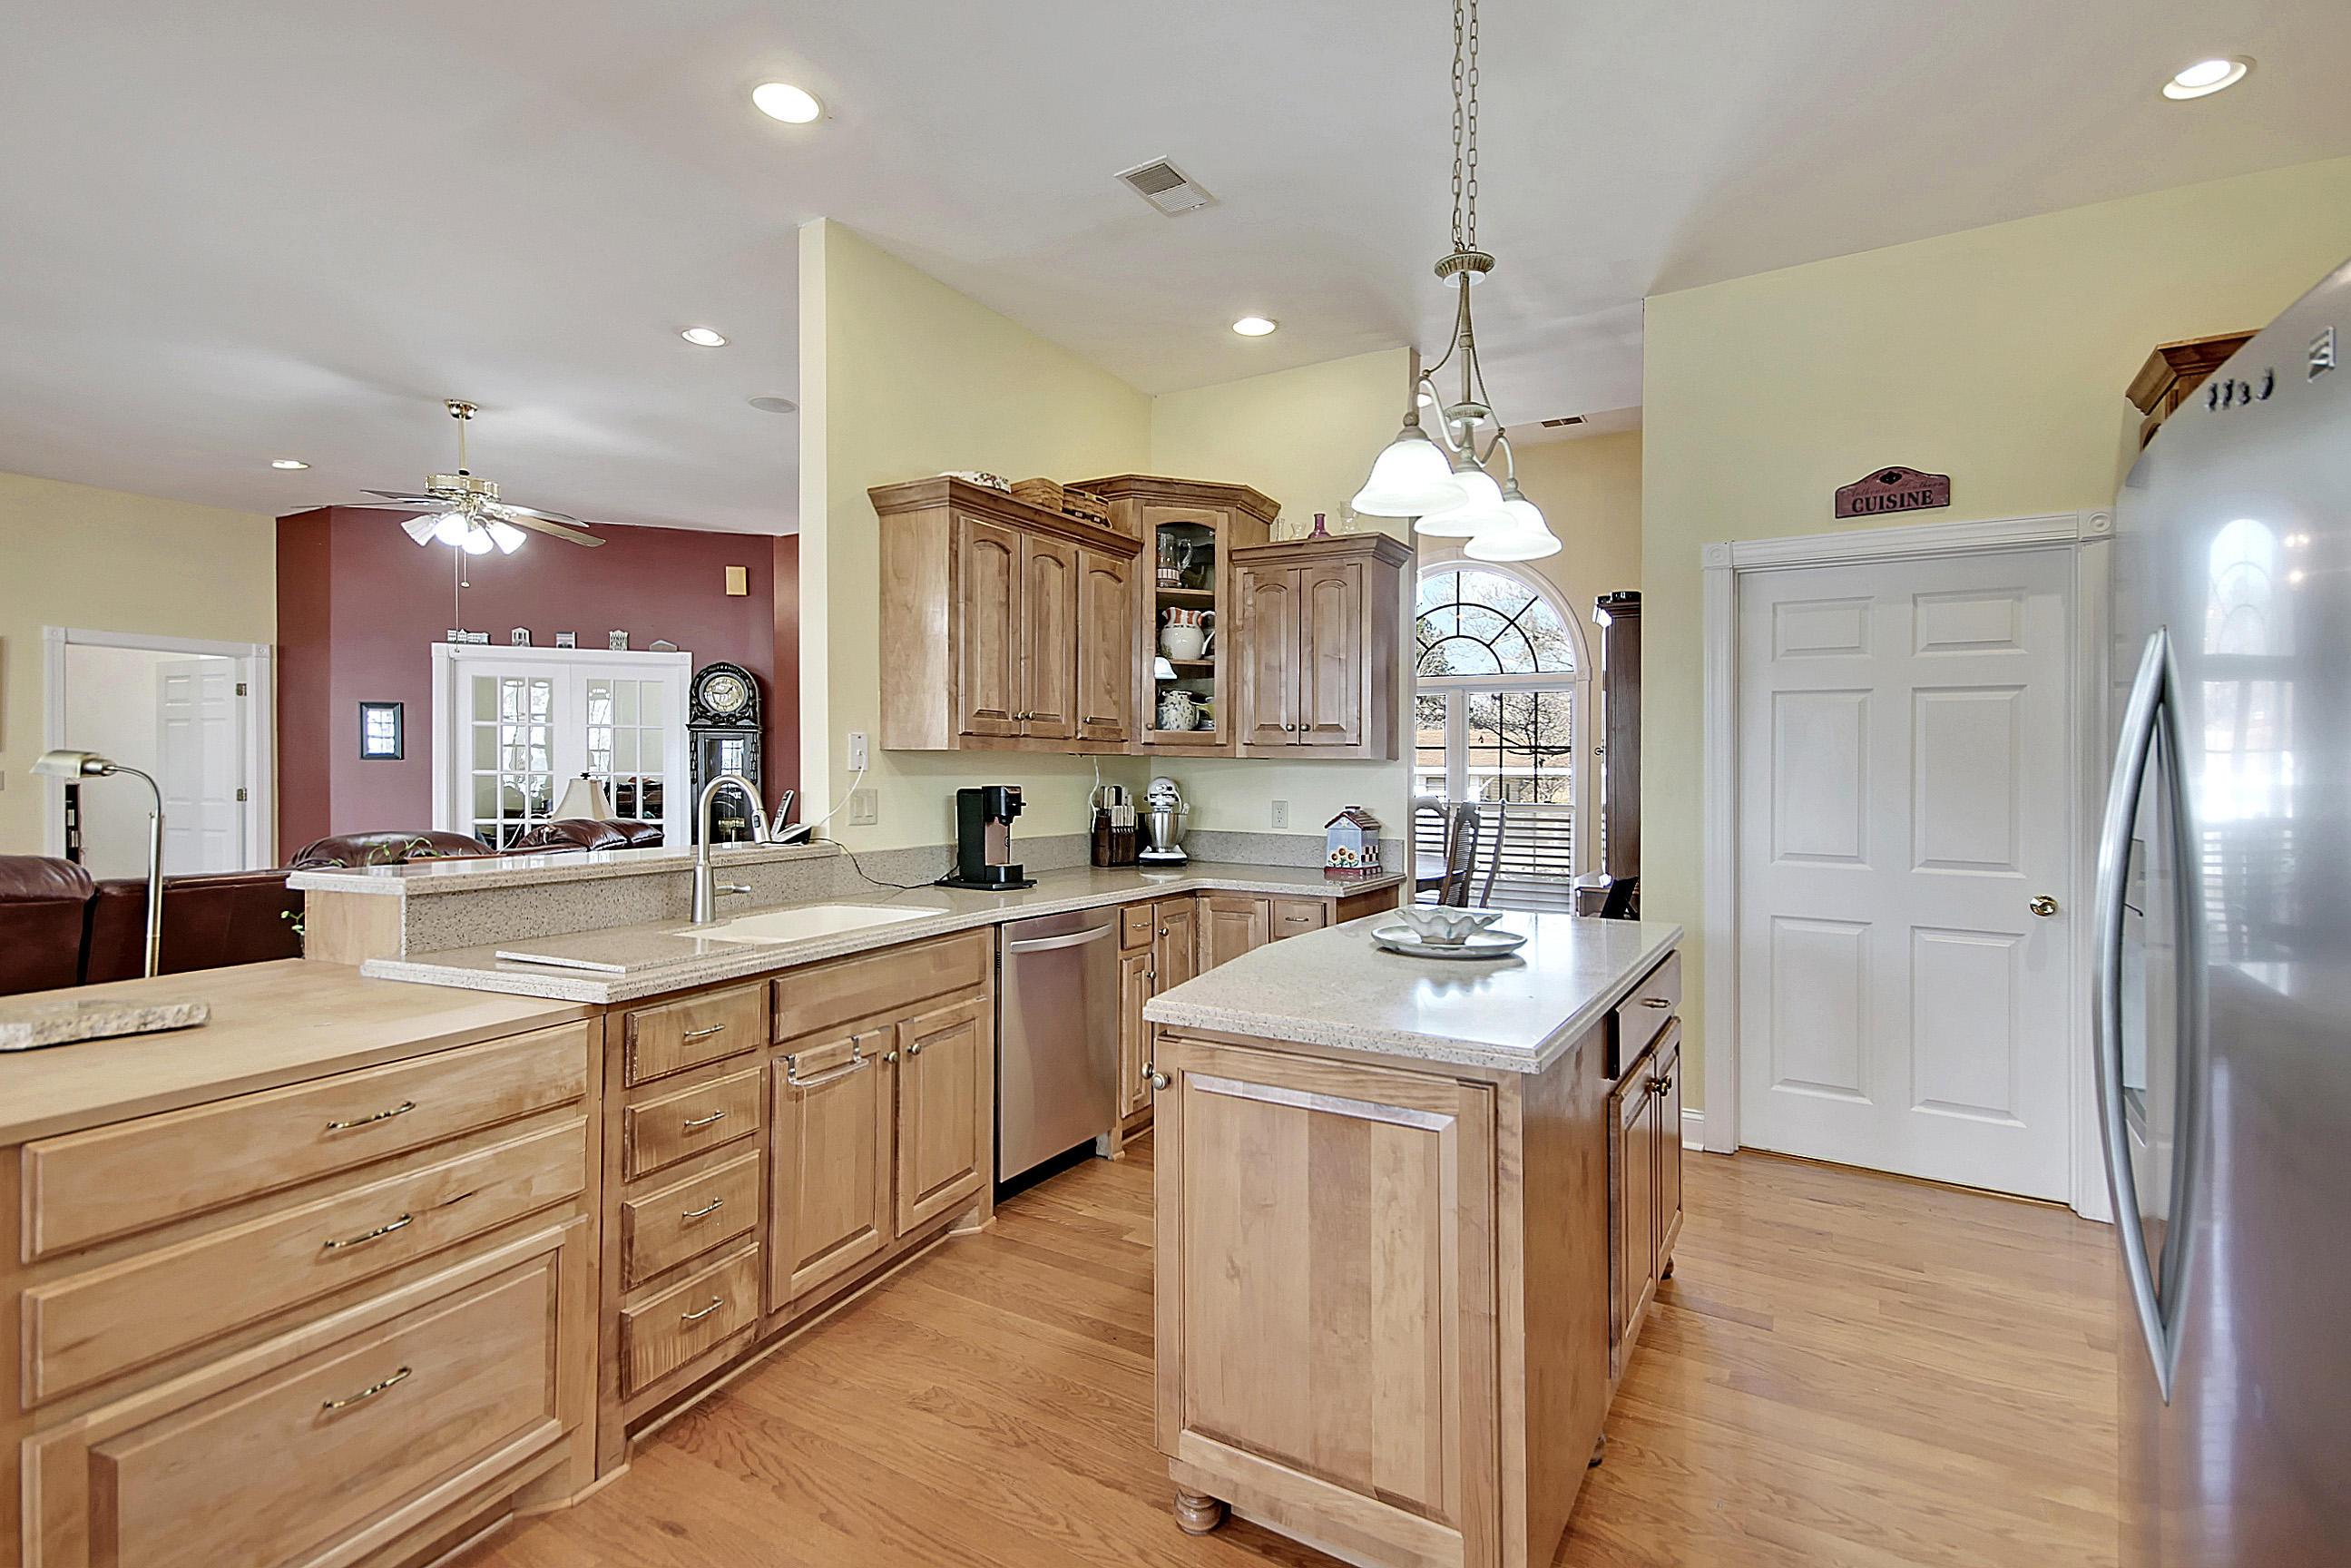 Cross Subd (Longpoint) Homes For Sale - 1191 Longpoint, Cross, SC - 12